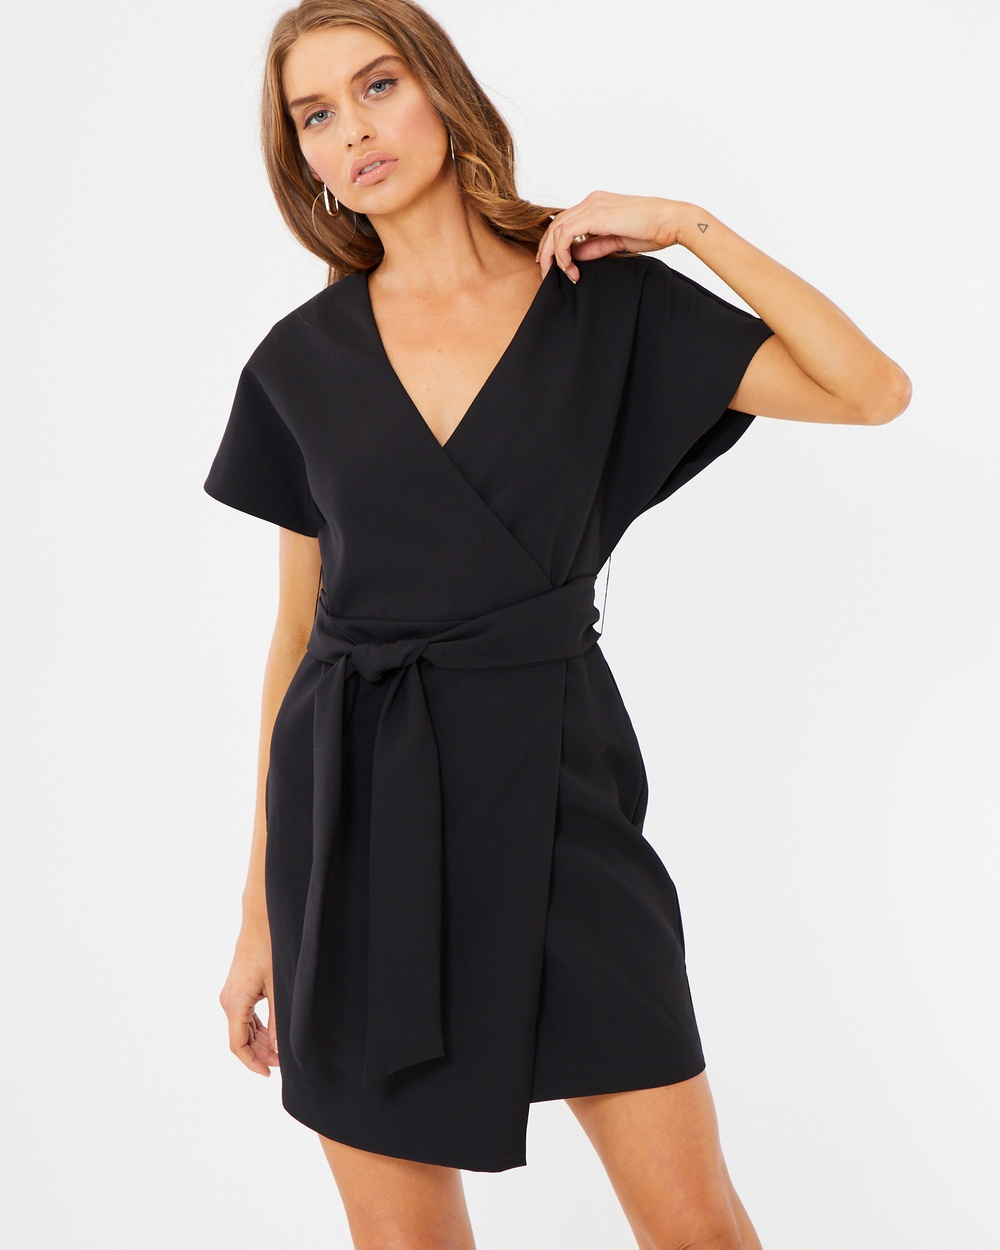 Photo of Tussah Black Octavia Kimono Dress - beautiful dress from Tussah online